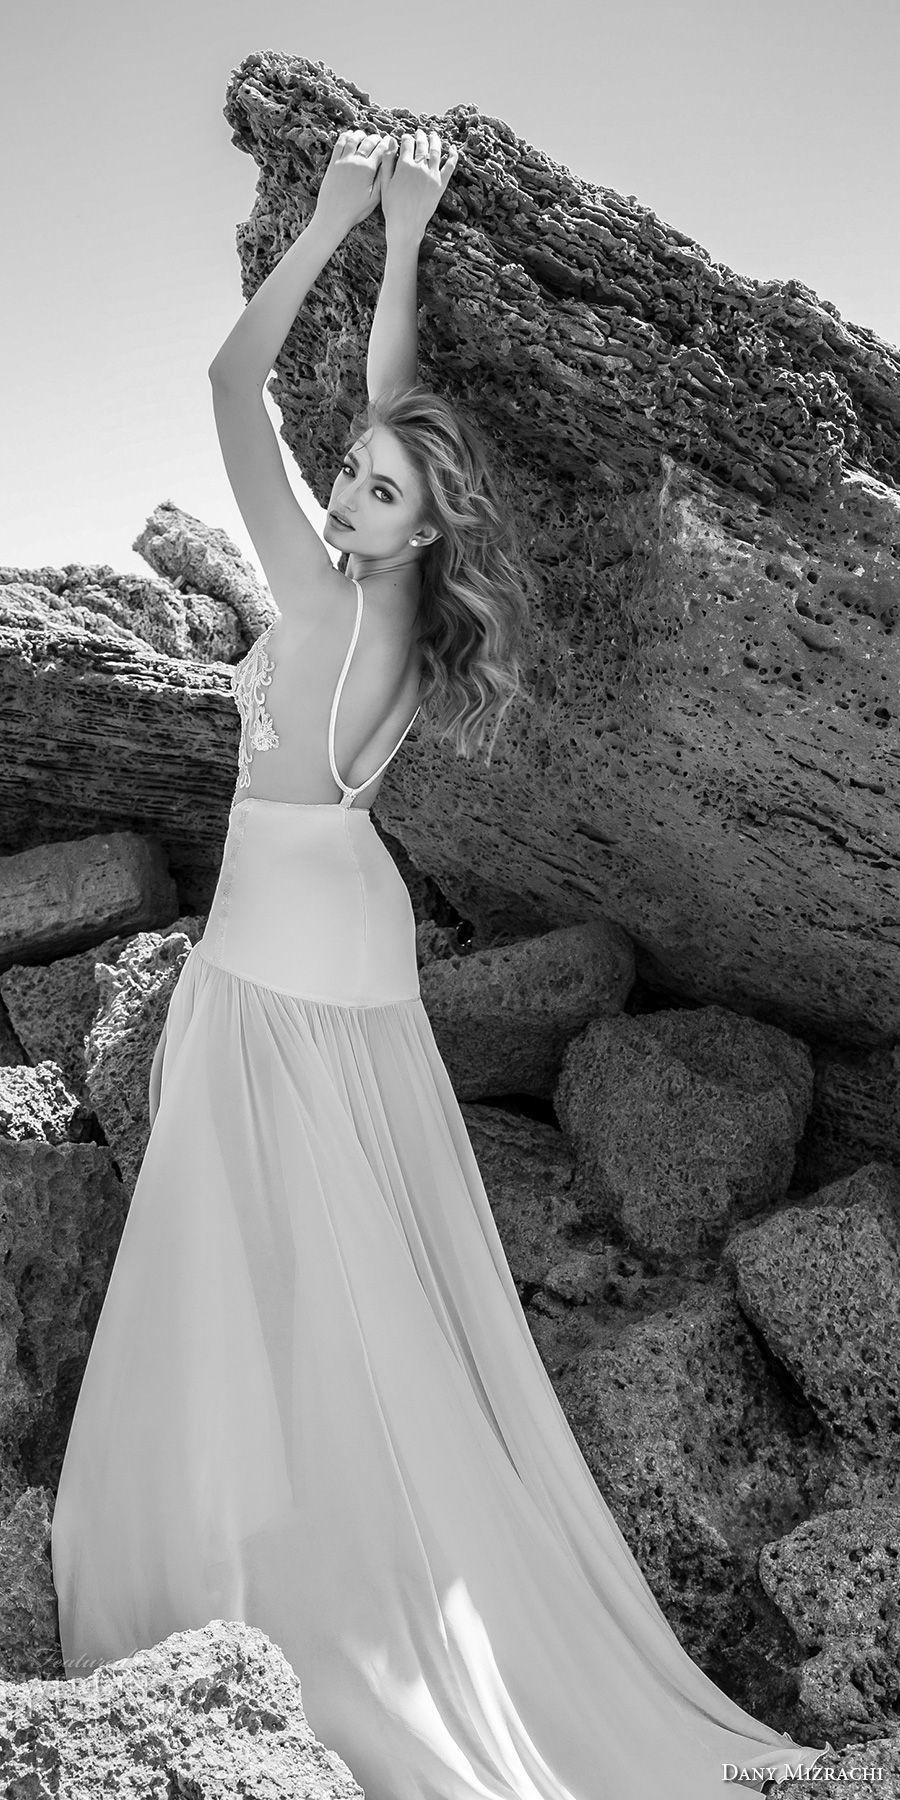 Dany mizrachi wedding dresses chapel train wedding dress and